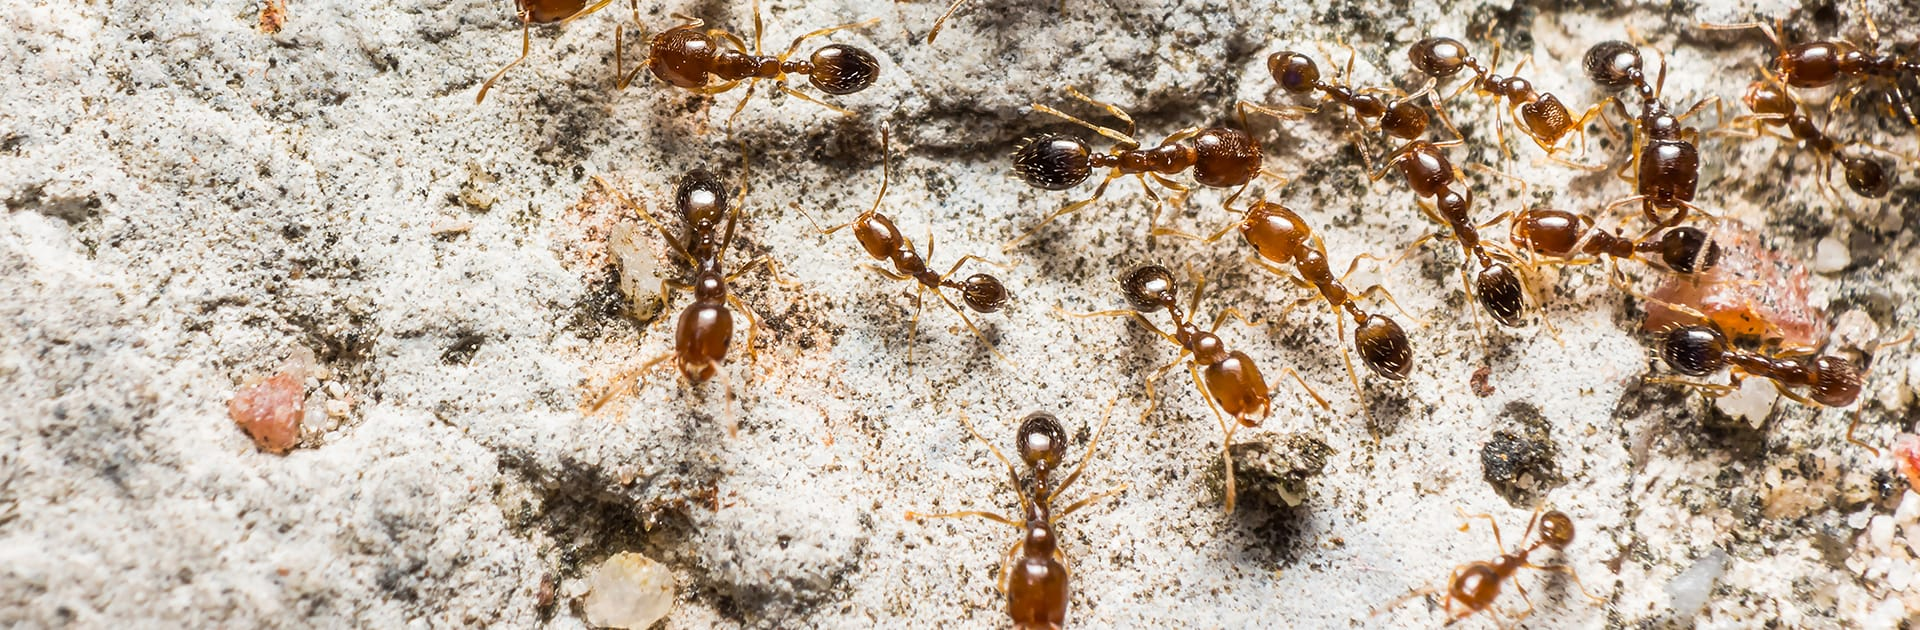 pharaoh ants crawling on a rock